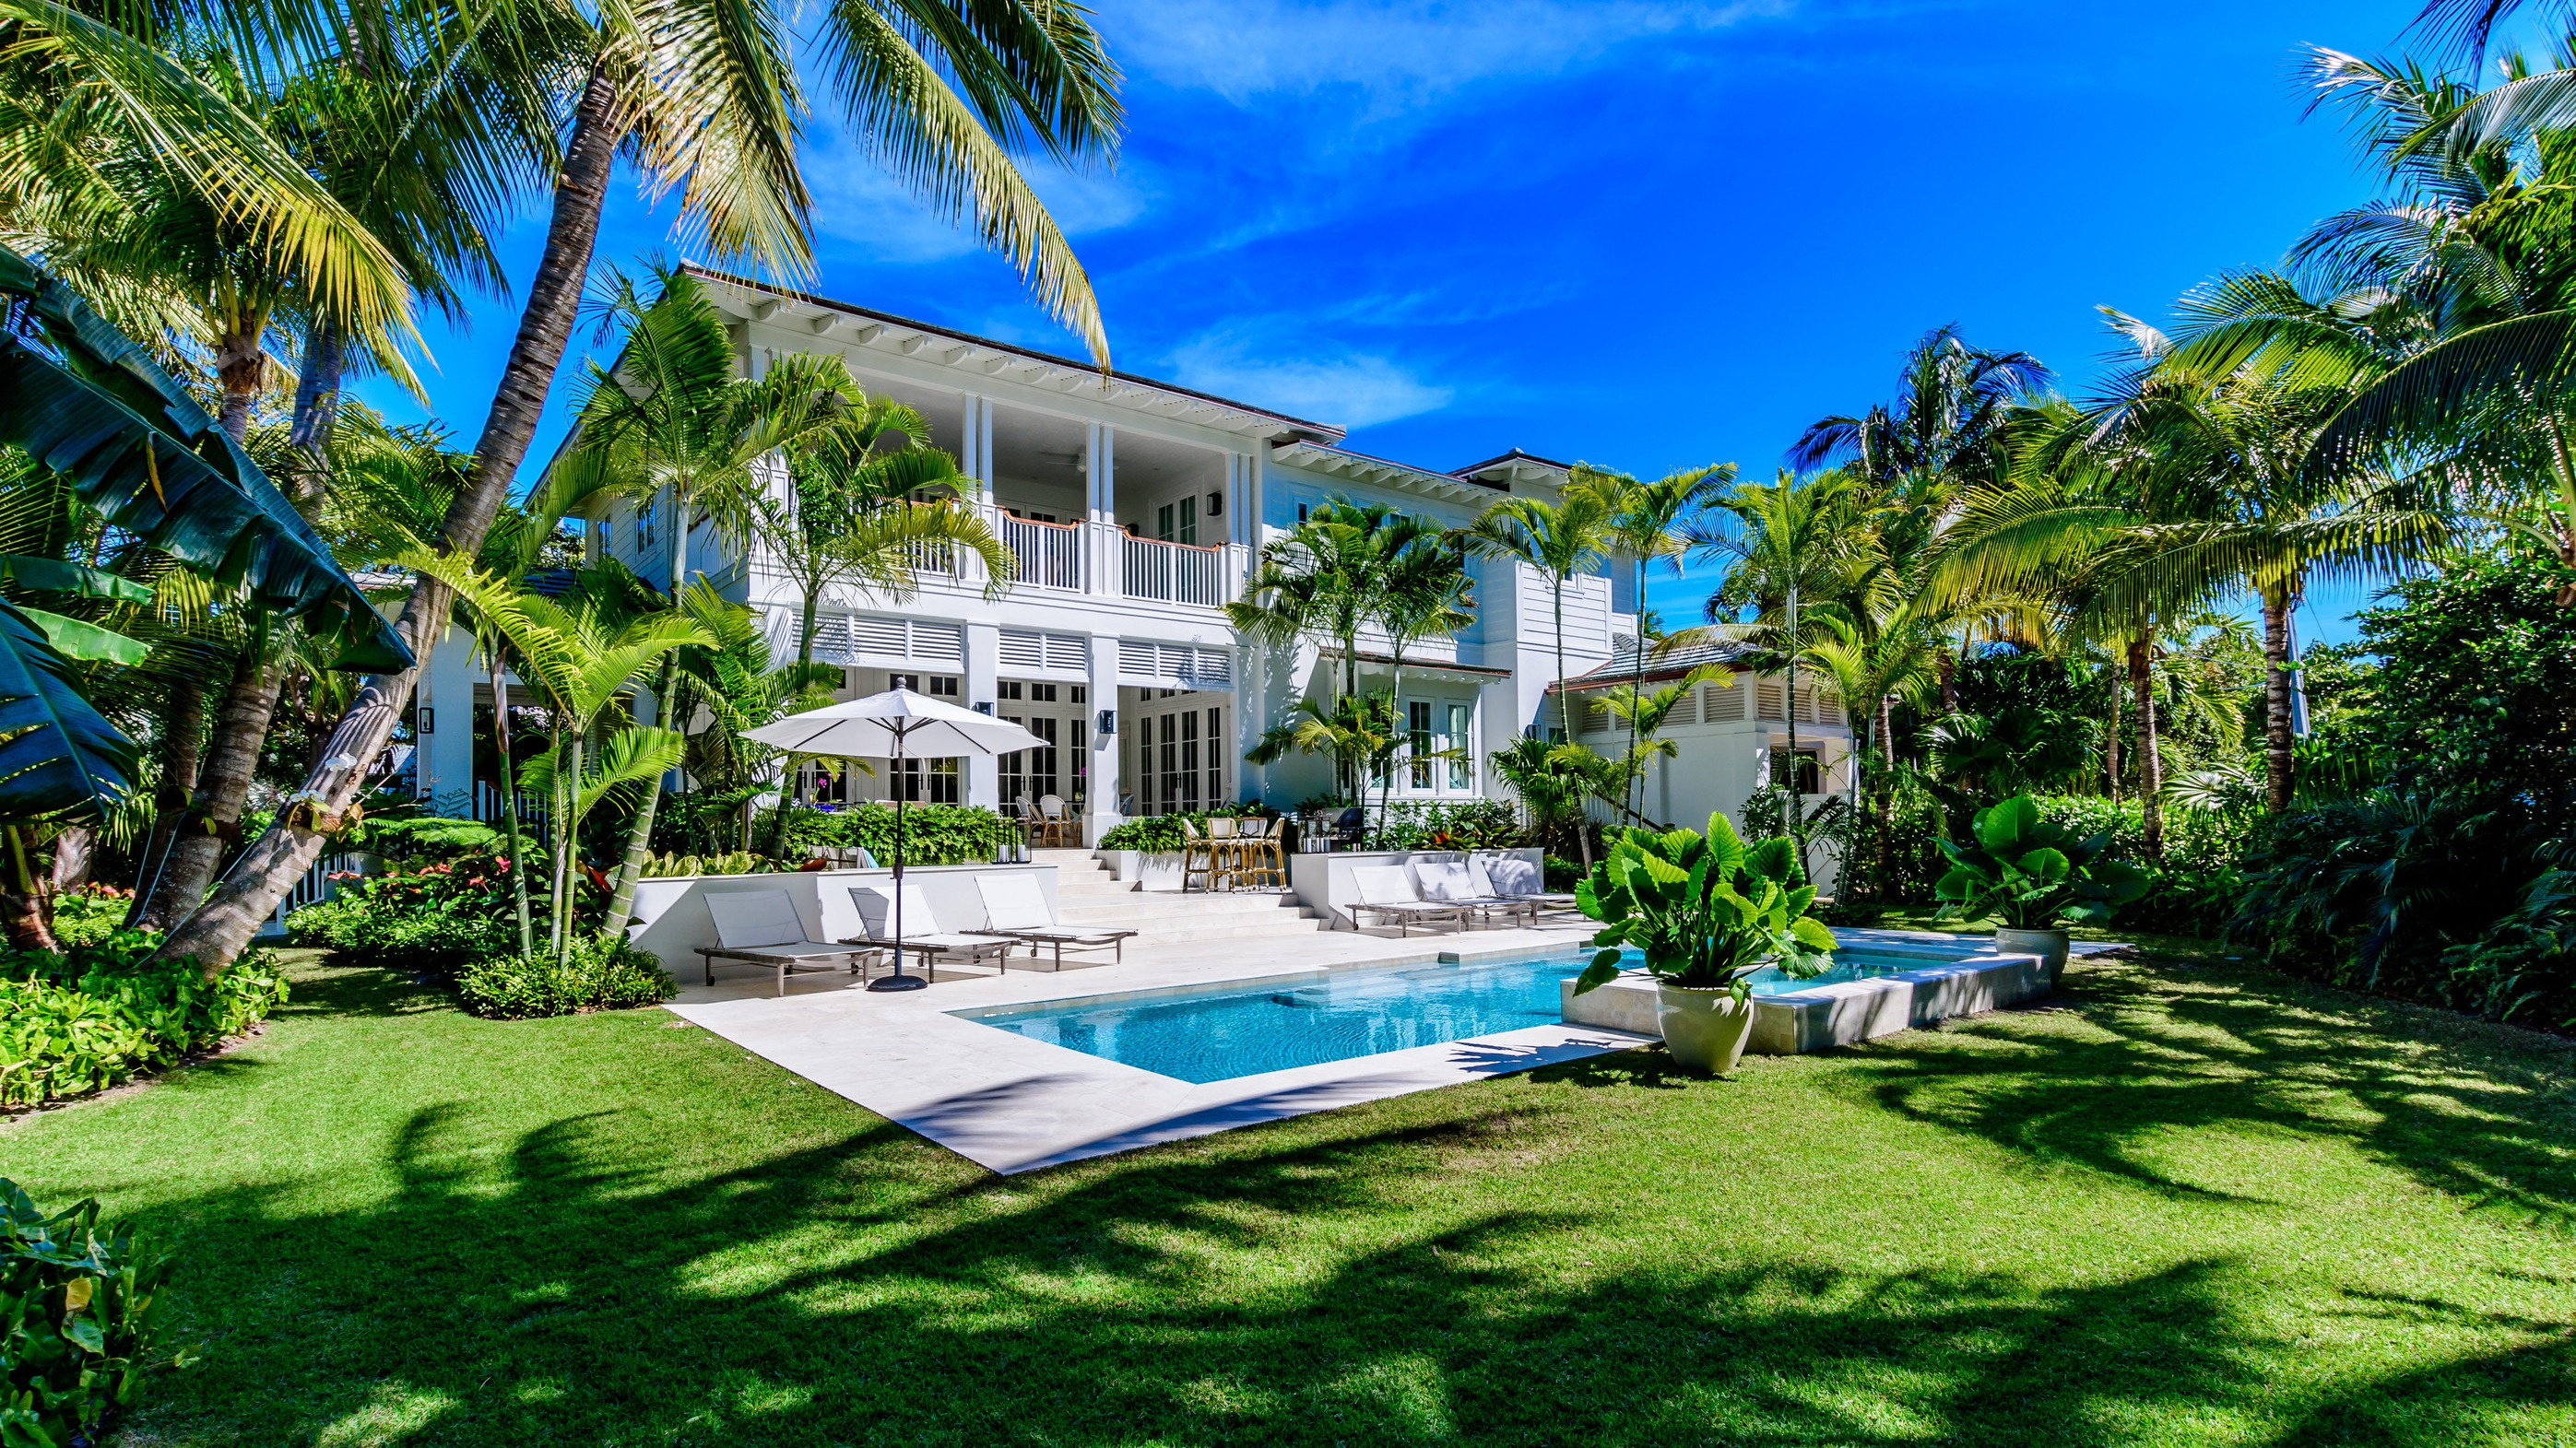 Miami, FL Vacation Rentals: house rentals & more | Vrbo